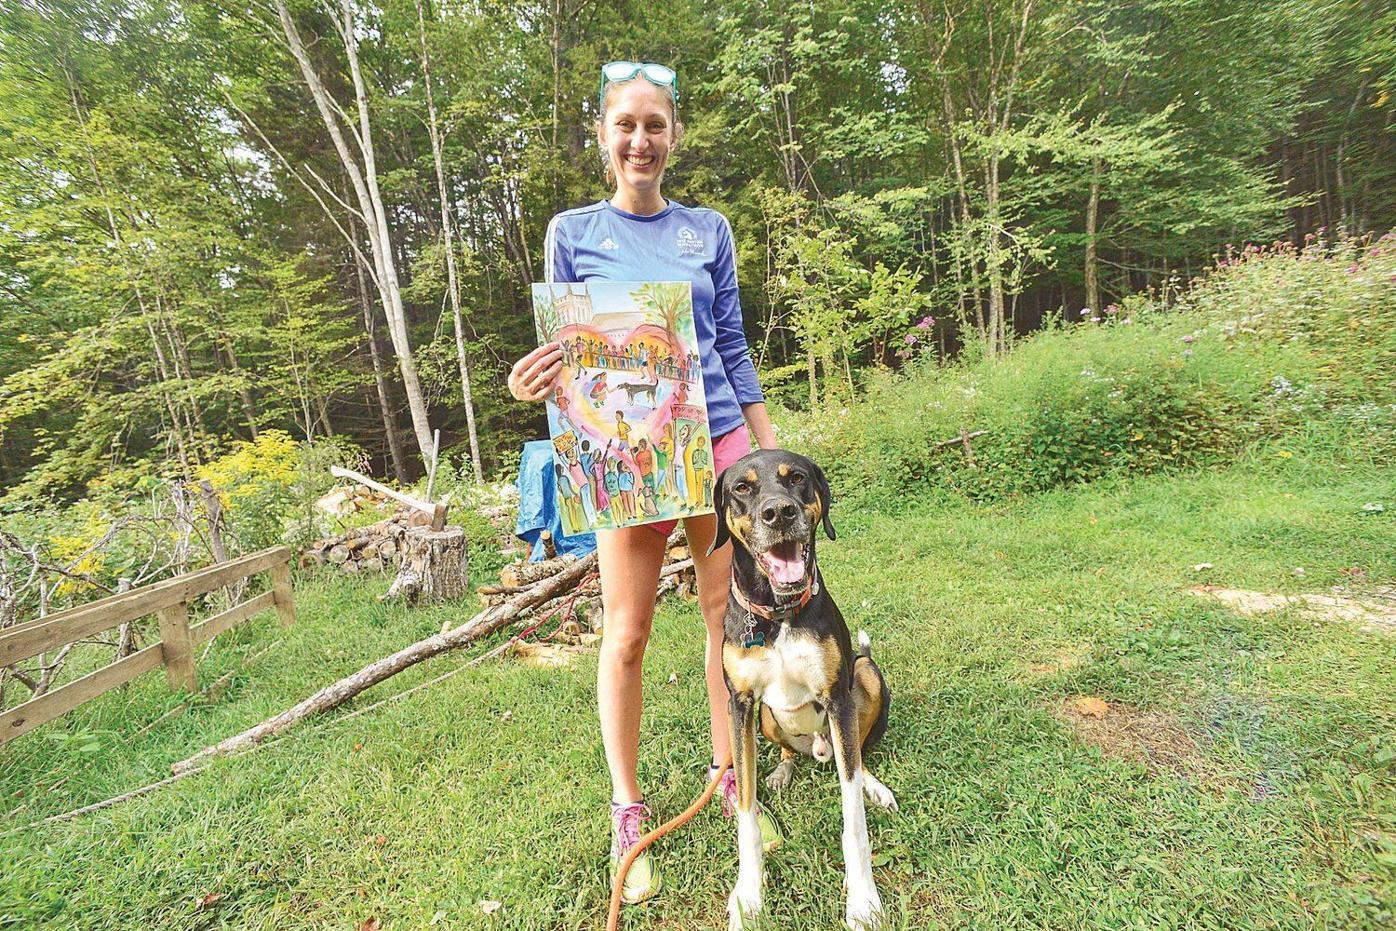 Local runner writes, illustrates children's book inspired by Boston Marathon